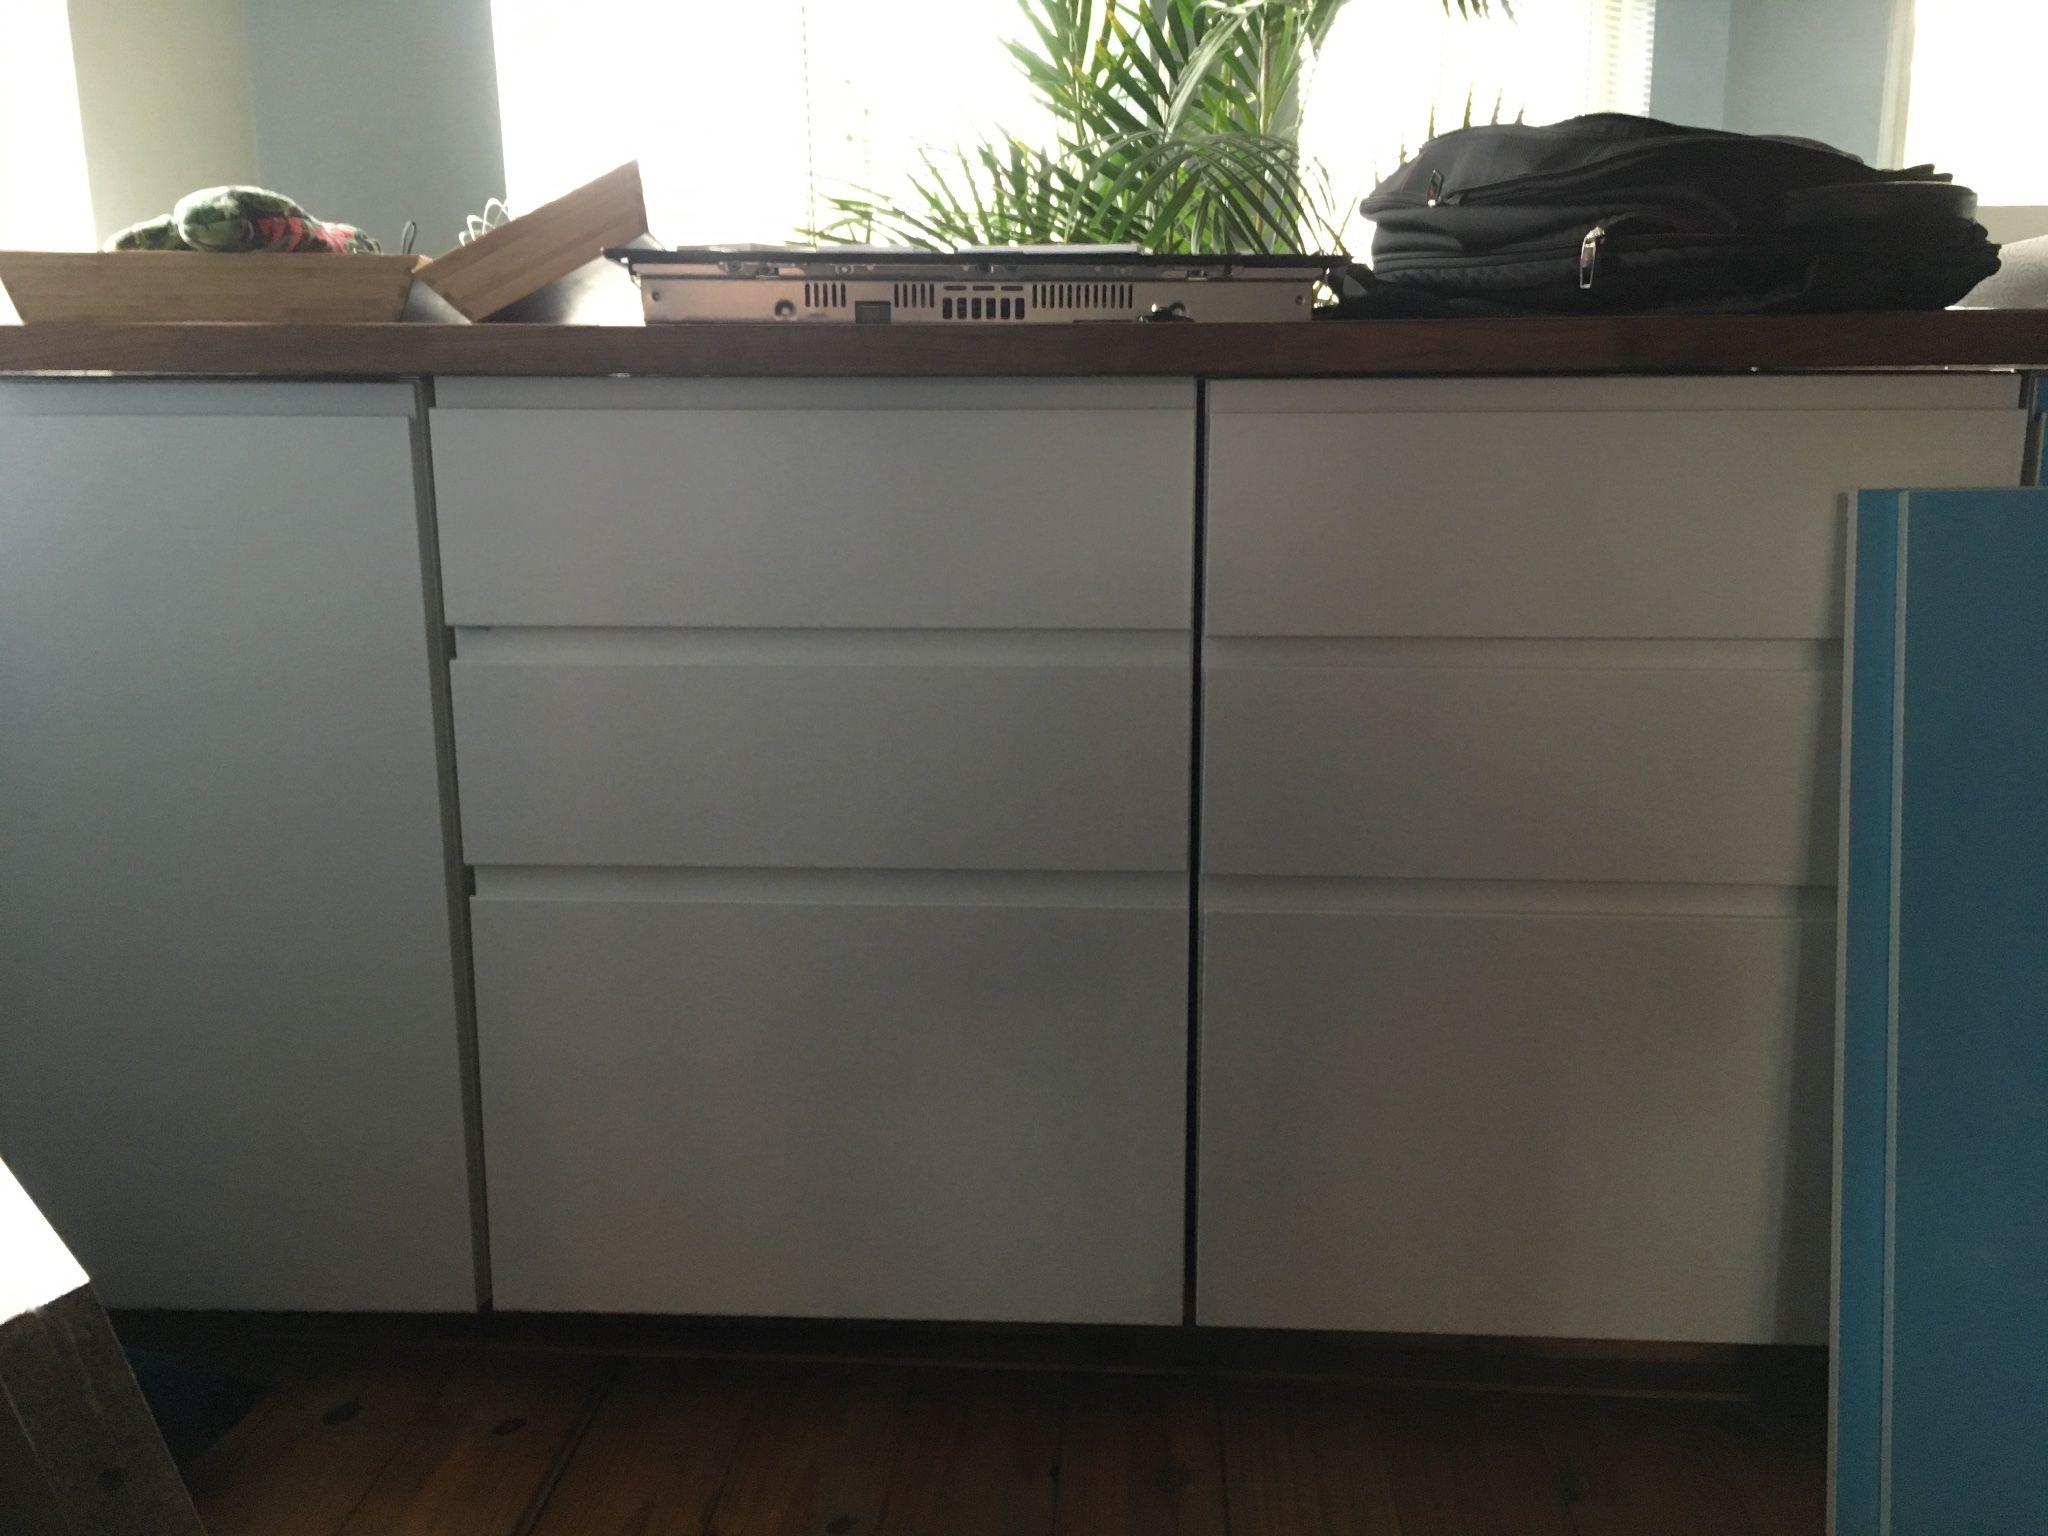 Ikea Keuken Plaatsen Incl Werkblad Zagen En Apparaten Aansluiten Werkspot